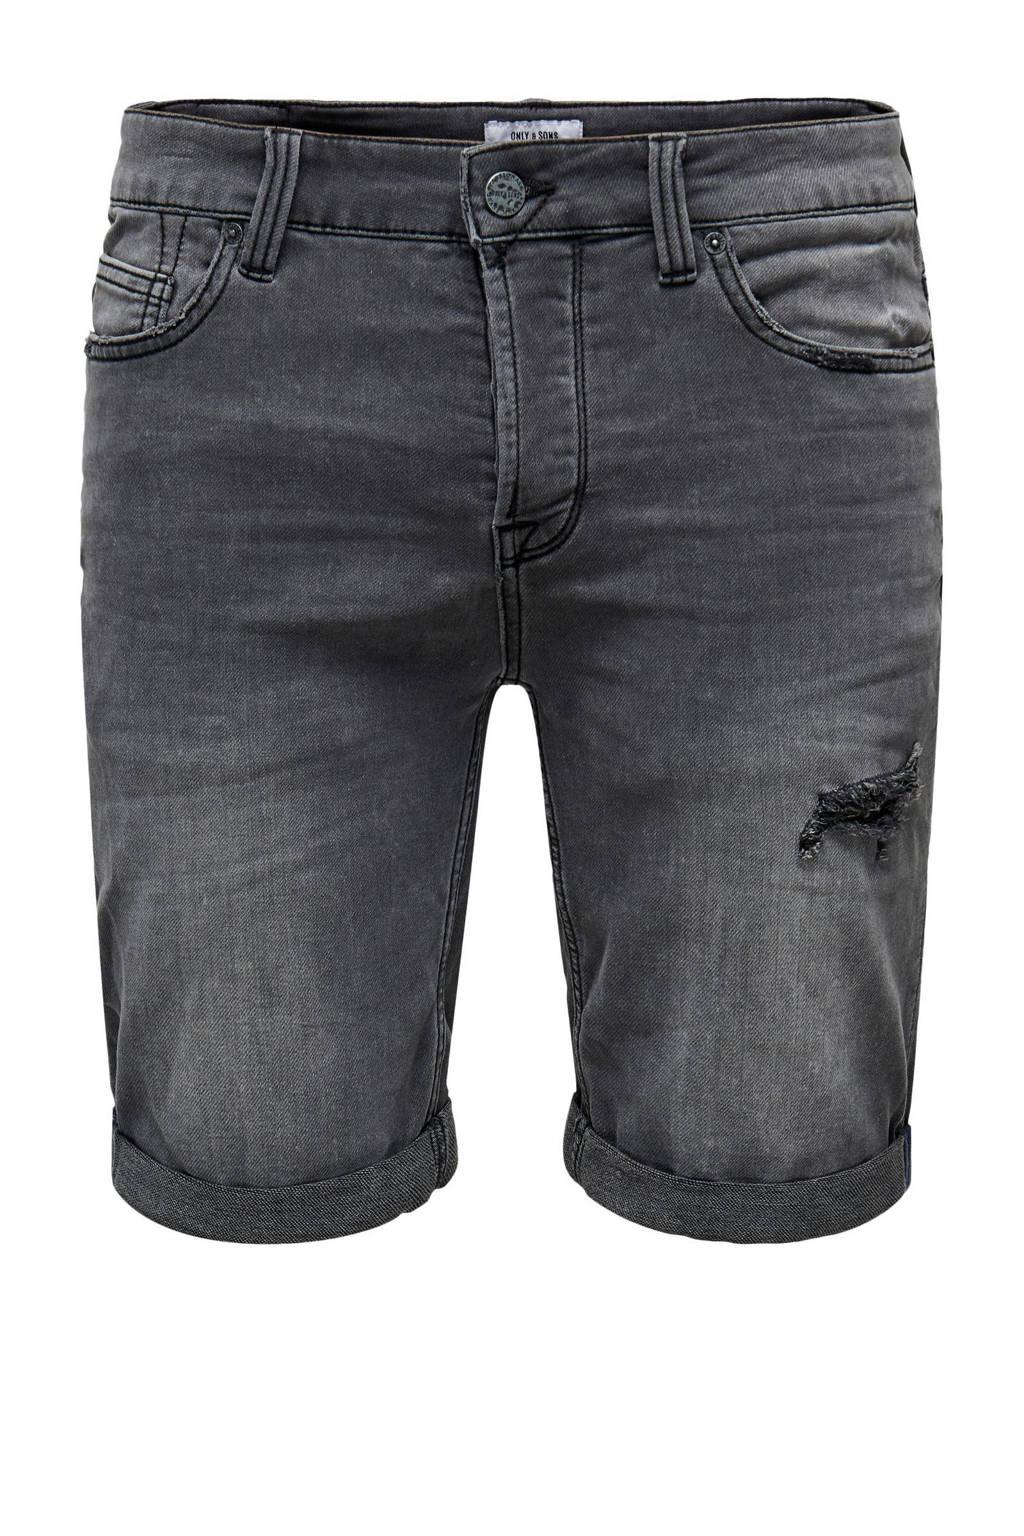 ONLY & SONS regular fit jeans short Ply grijs, Grijs